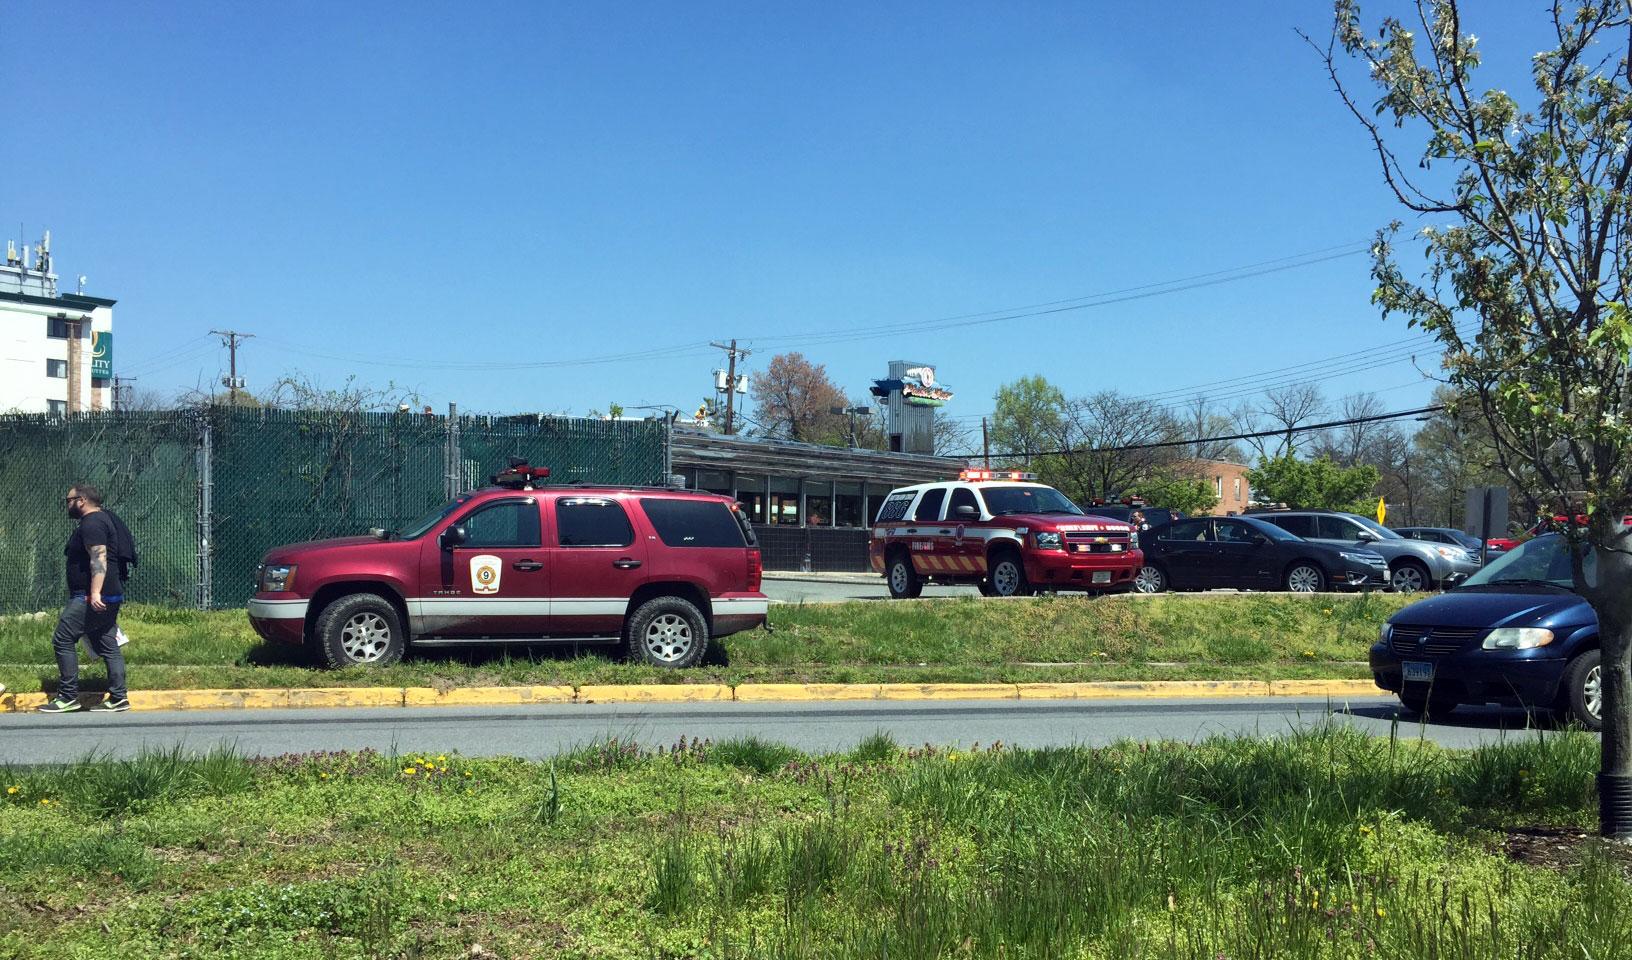 Fire guts popular College Park diner